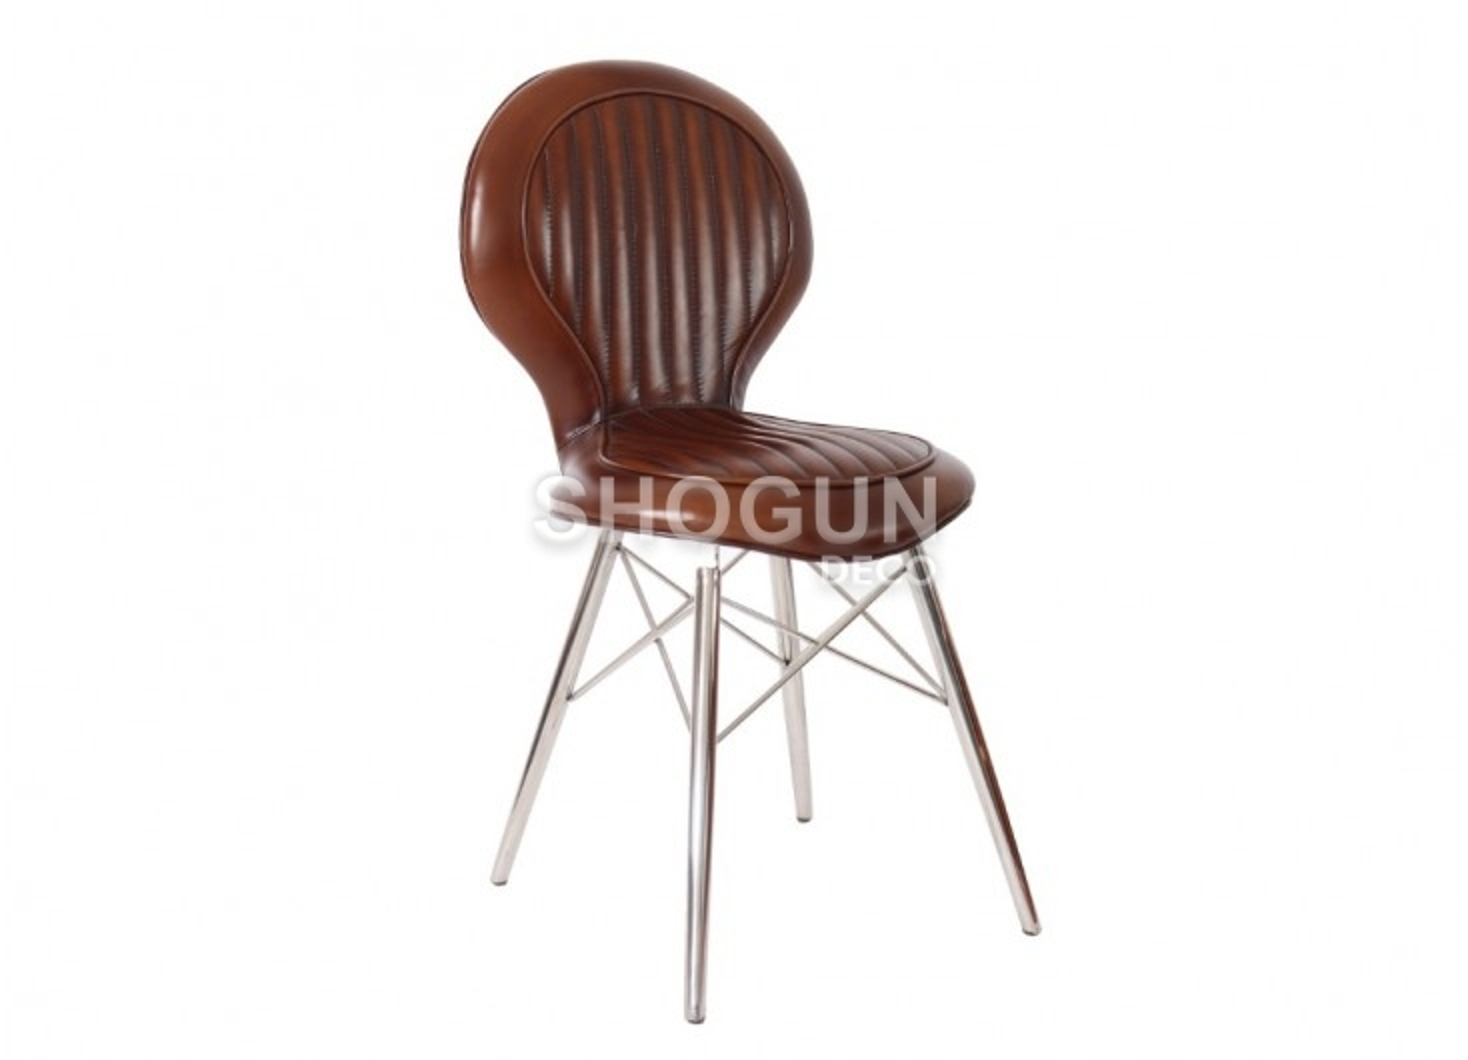 Aviator chair - Brown leather